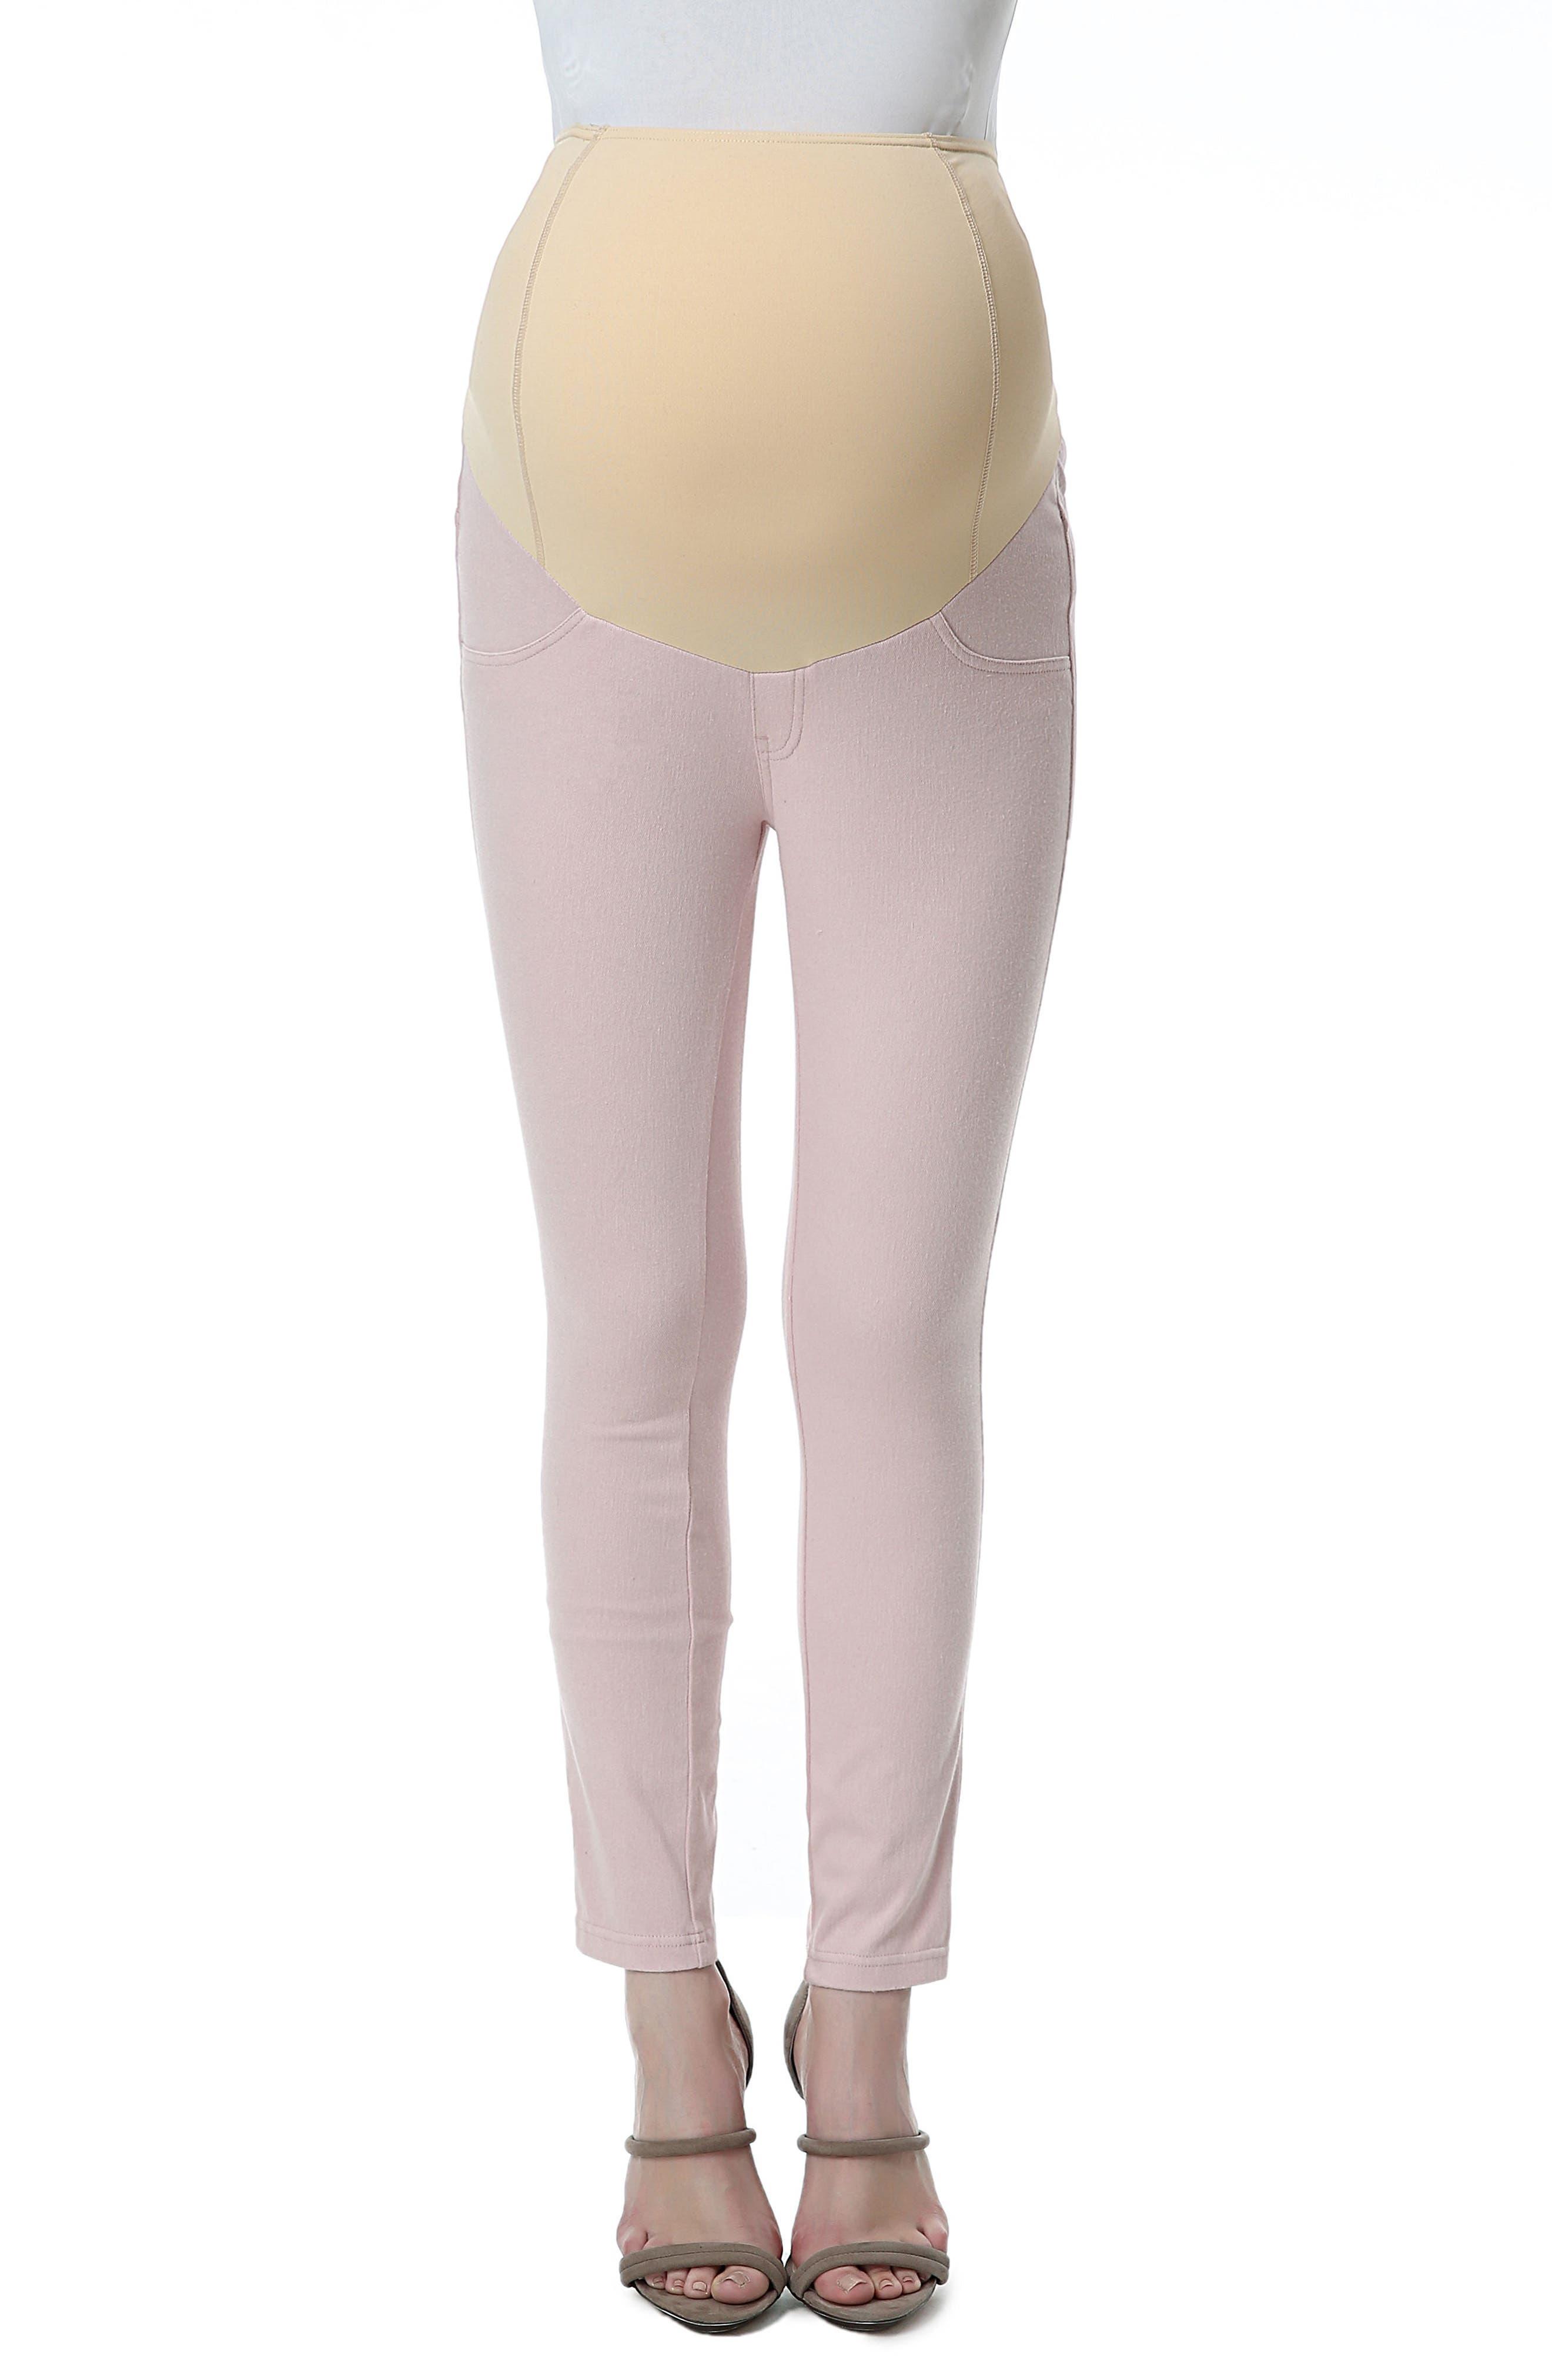 Kimi & Kai Lenora Maternity Leggings